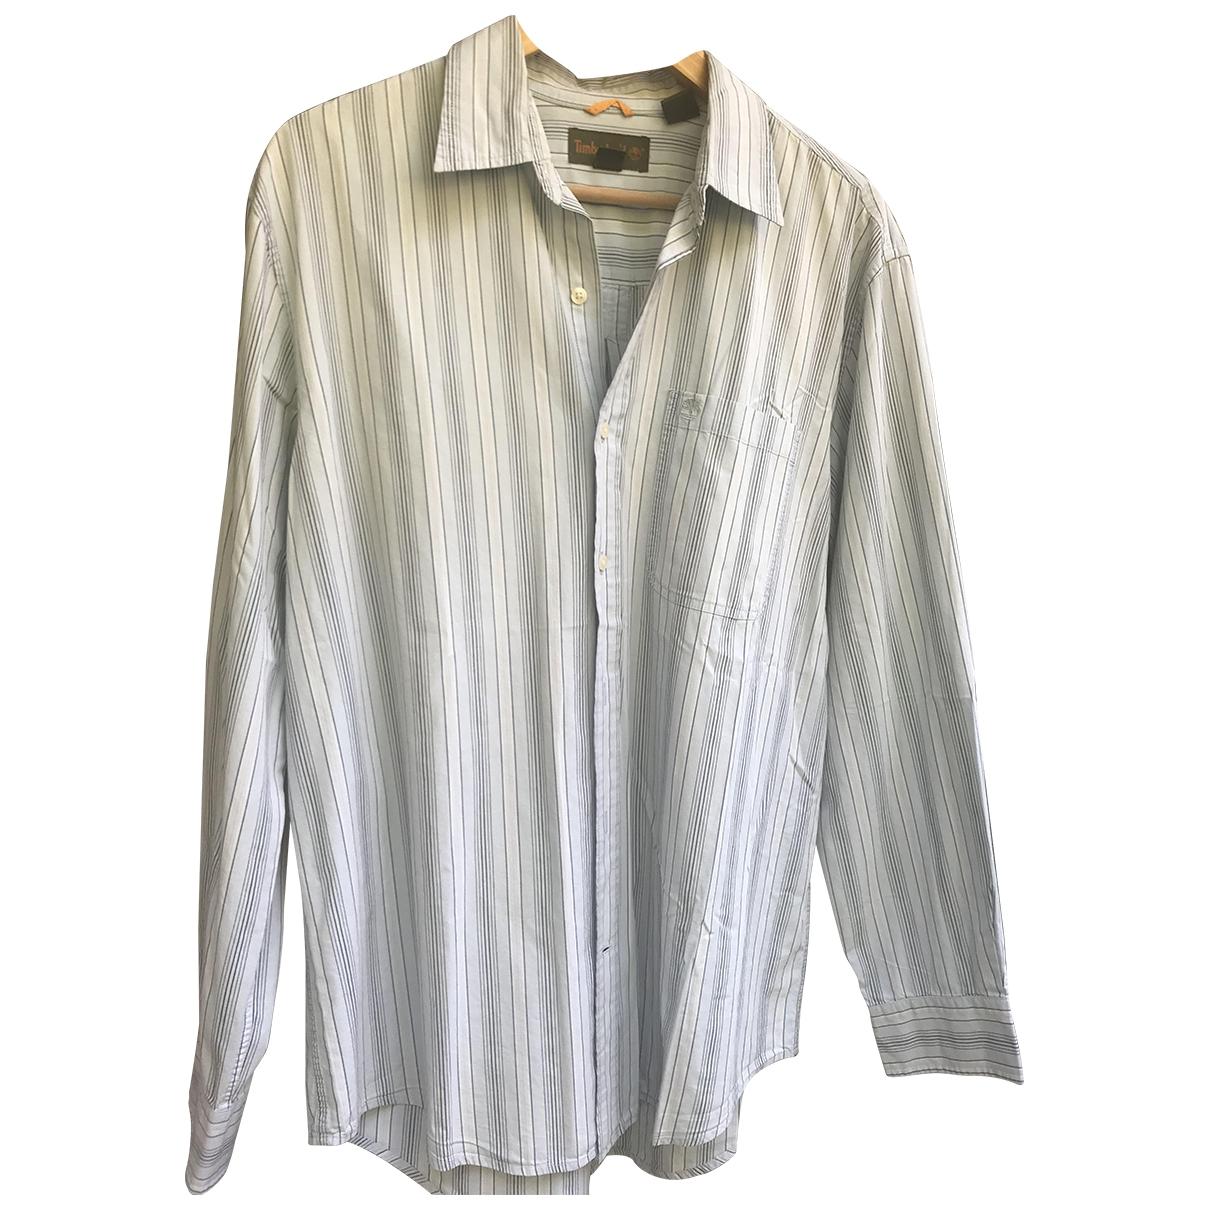 Timberland \N Blue Cotton Shirts for Men L International